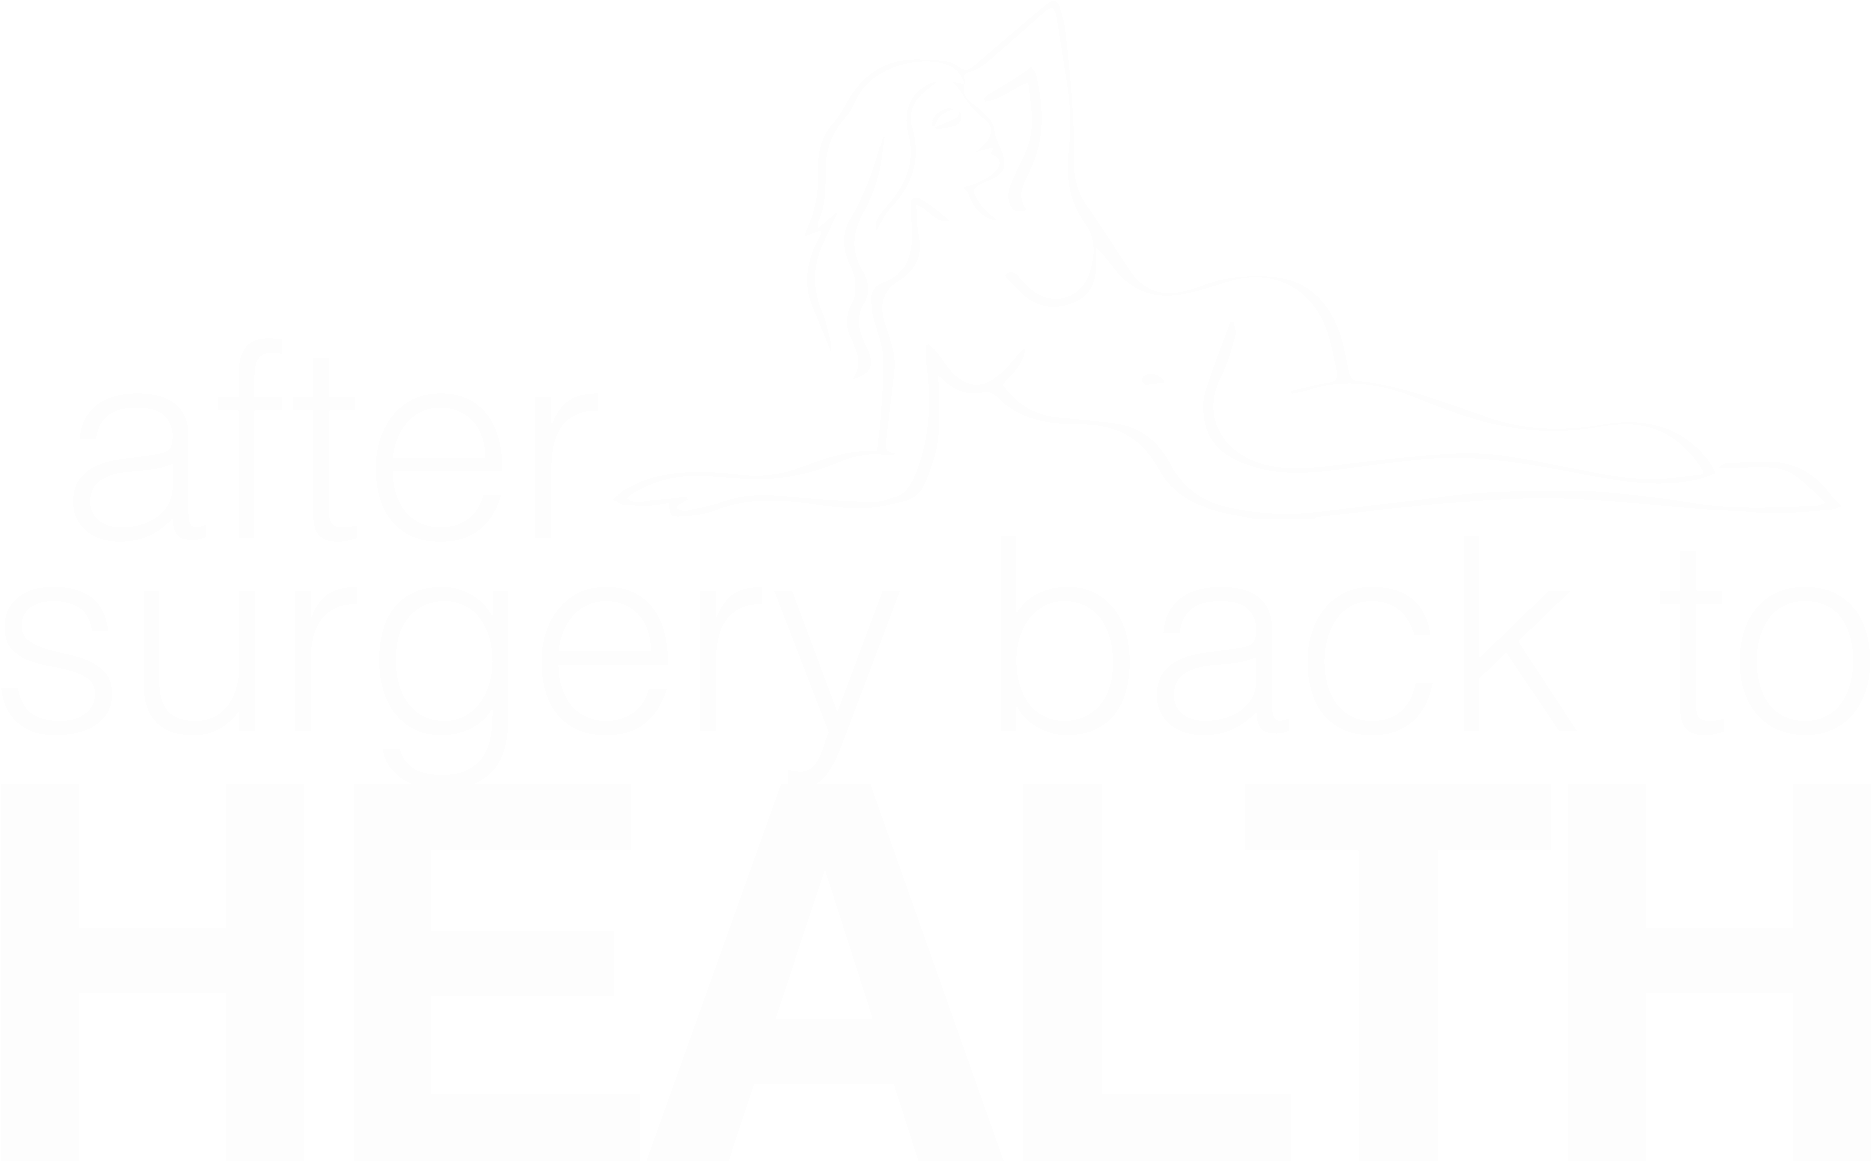 After Surgery Help